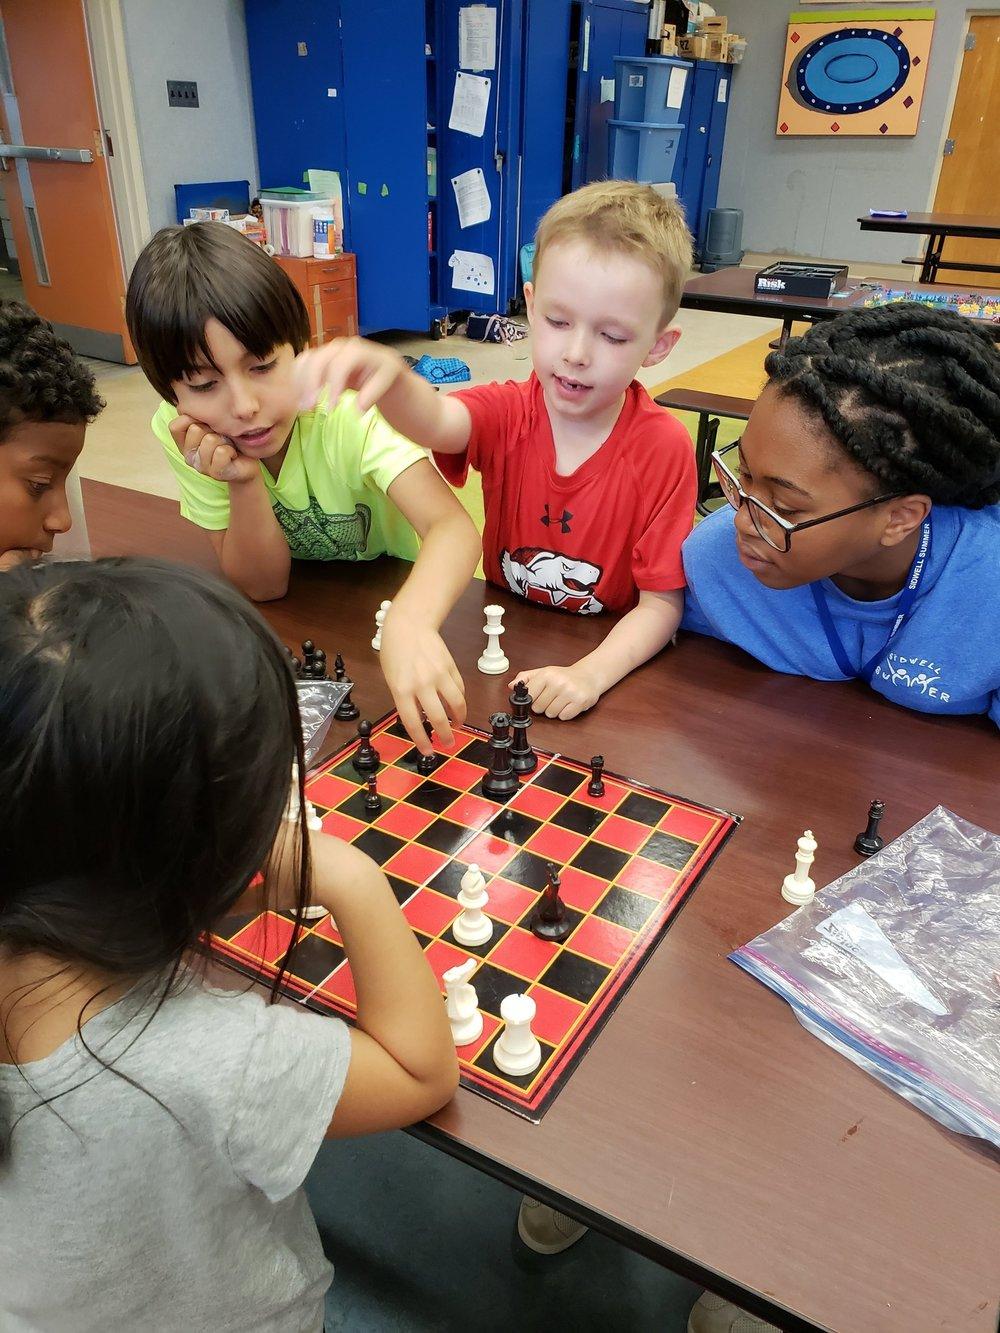 chesschess.jpg